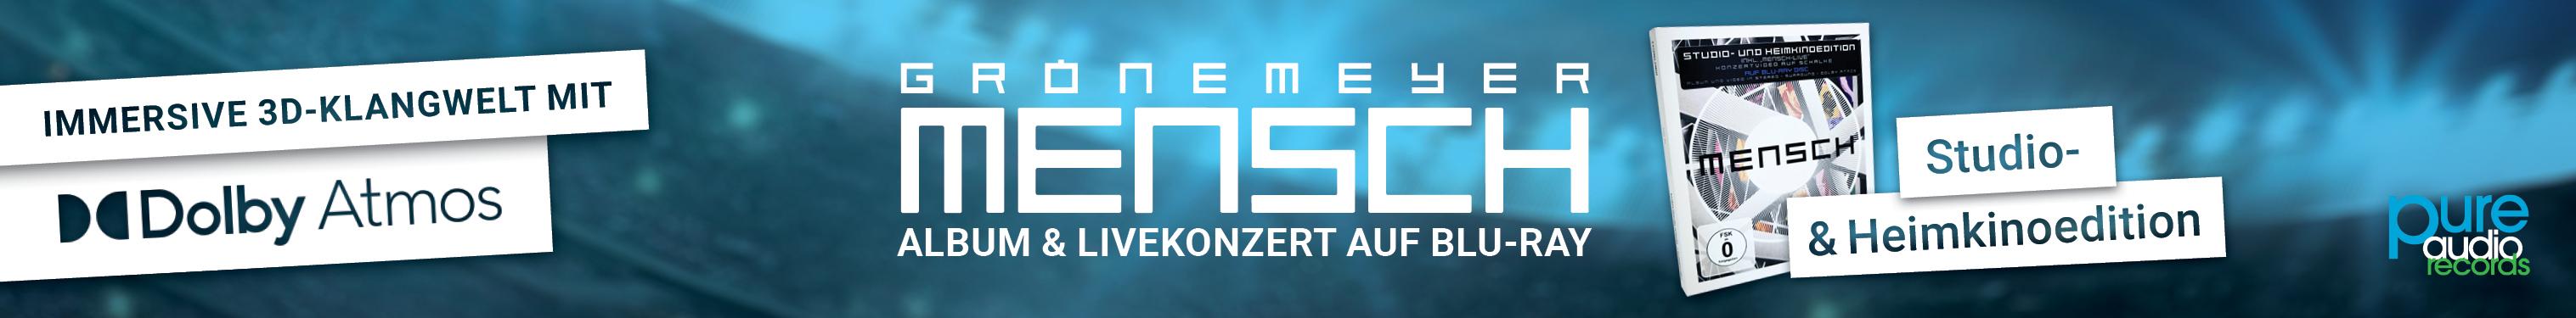 Dolby Atmos / Grönemeyer